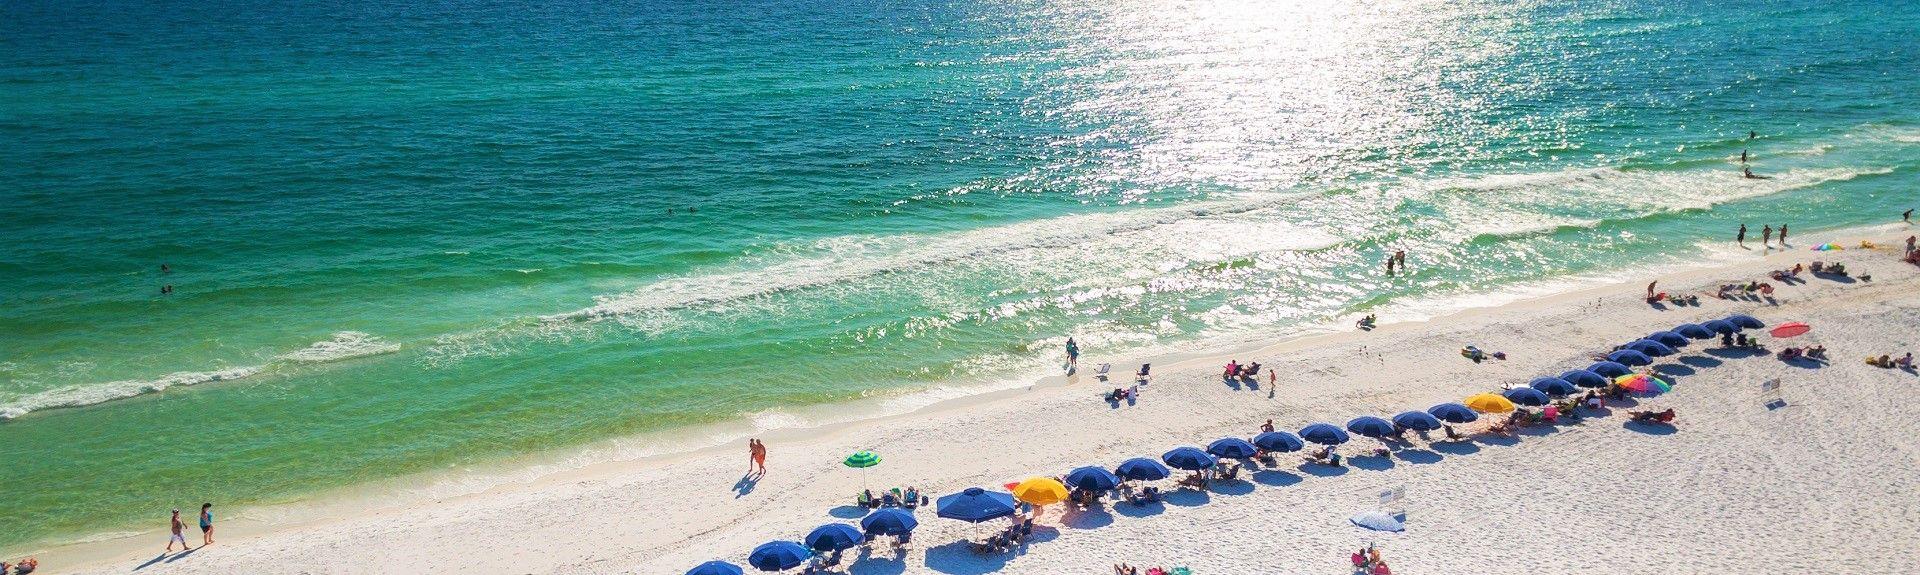 Majestic Sun, Destin, FL, USA